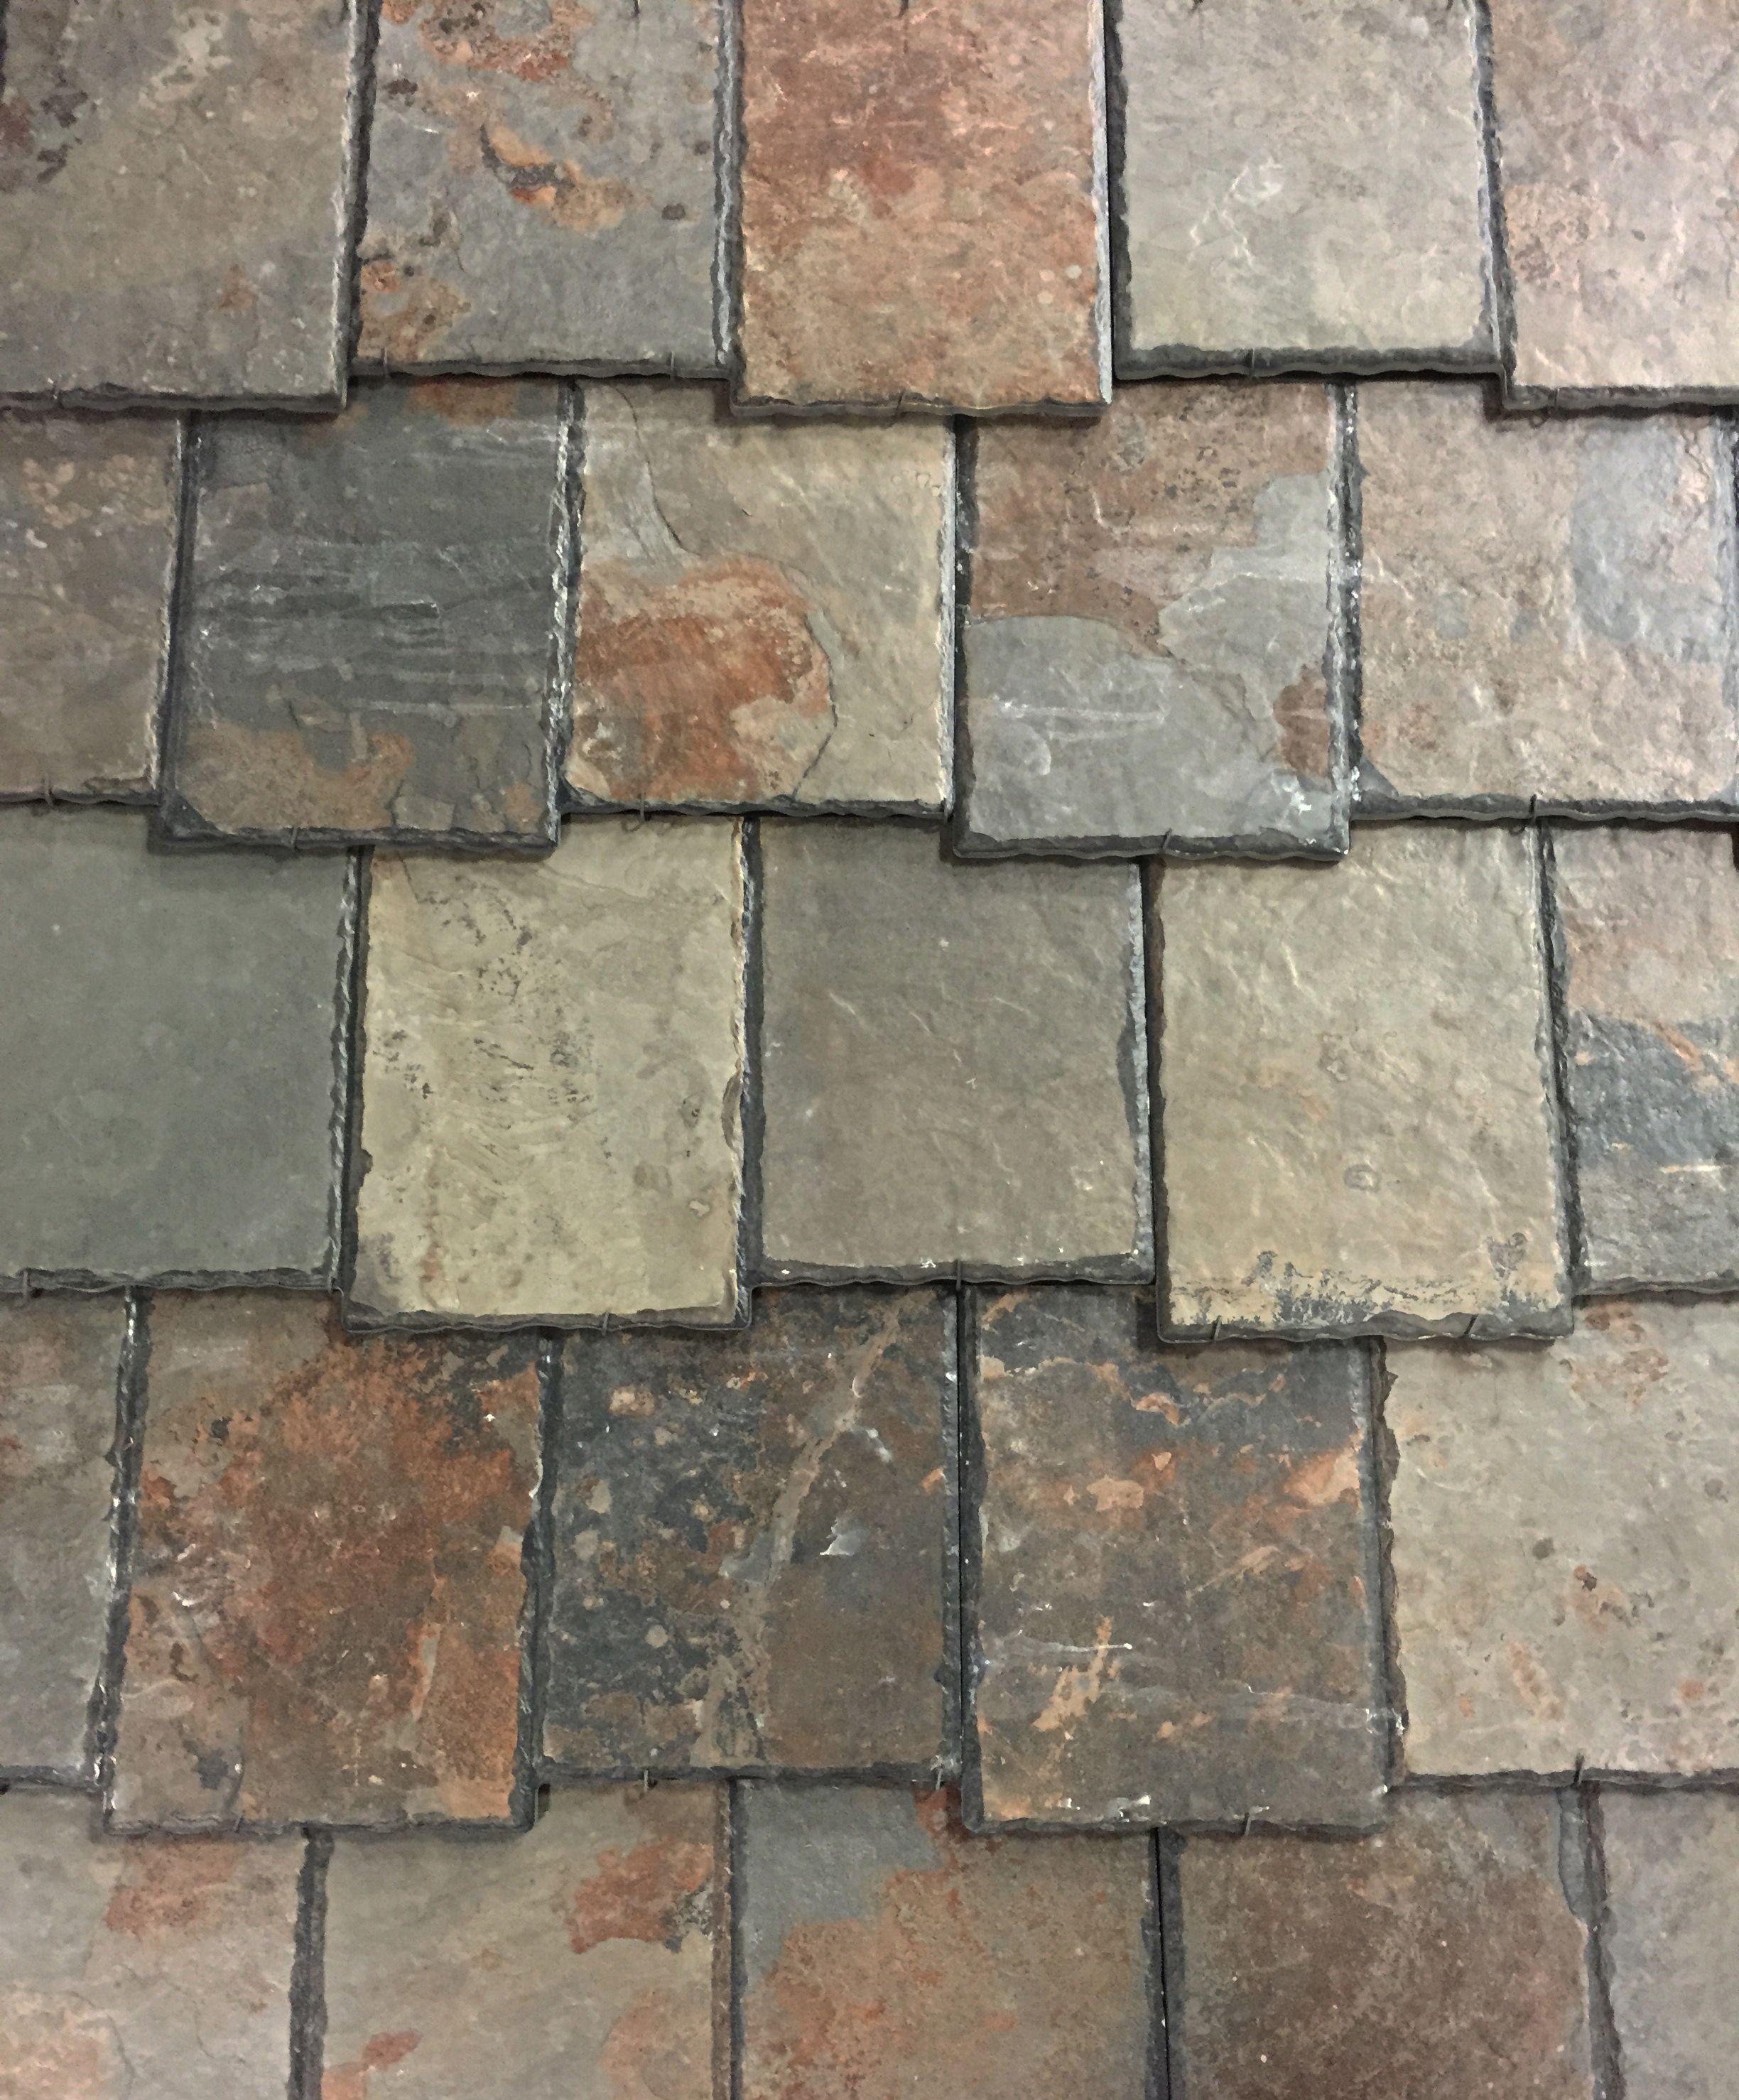 Tuscan Tile Roof Made To Look Like Slate Ironstone